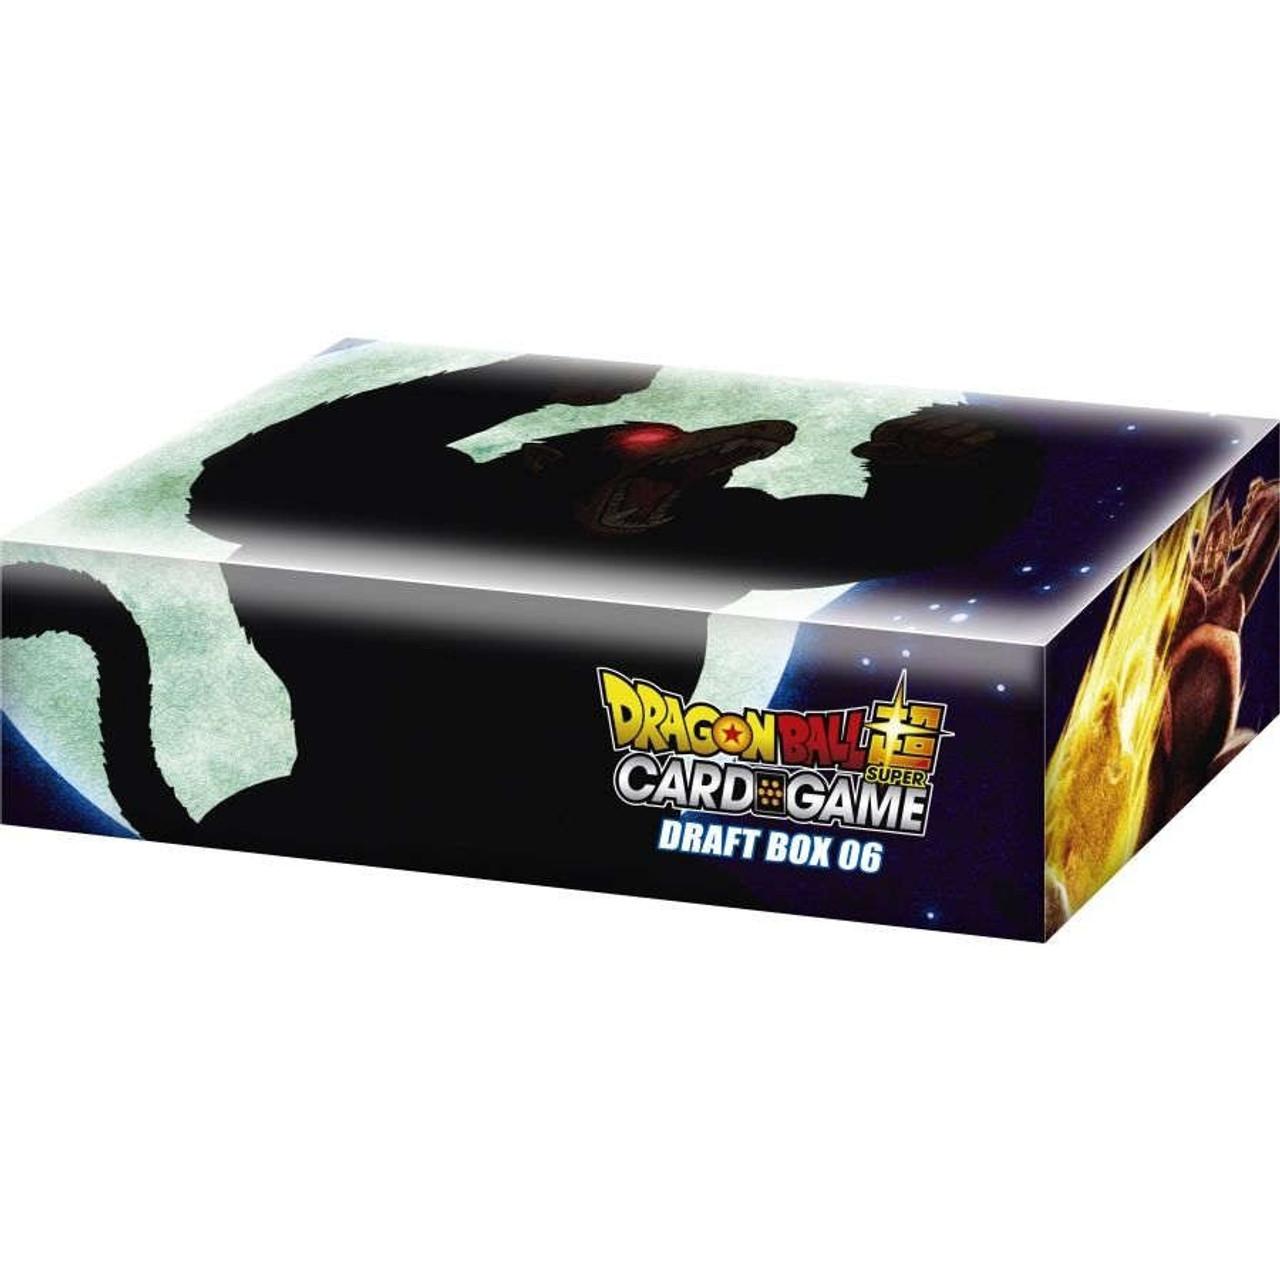 Dragon Ball Super Trading Card Game Draft Box 06 Giant Force Booster Box 24 Packs Bandai America Toywiz